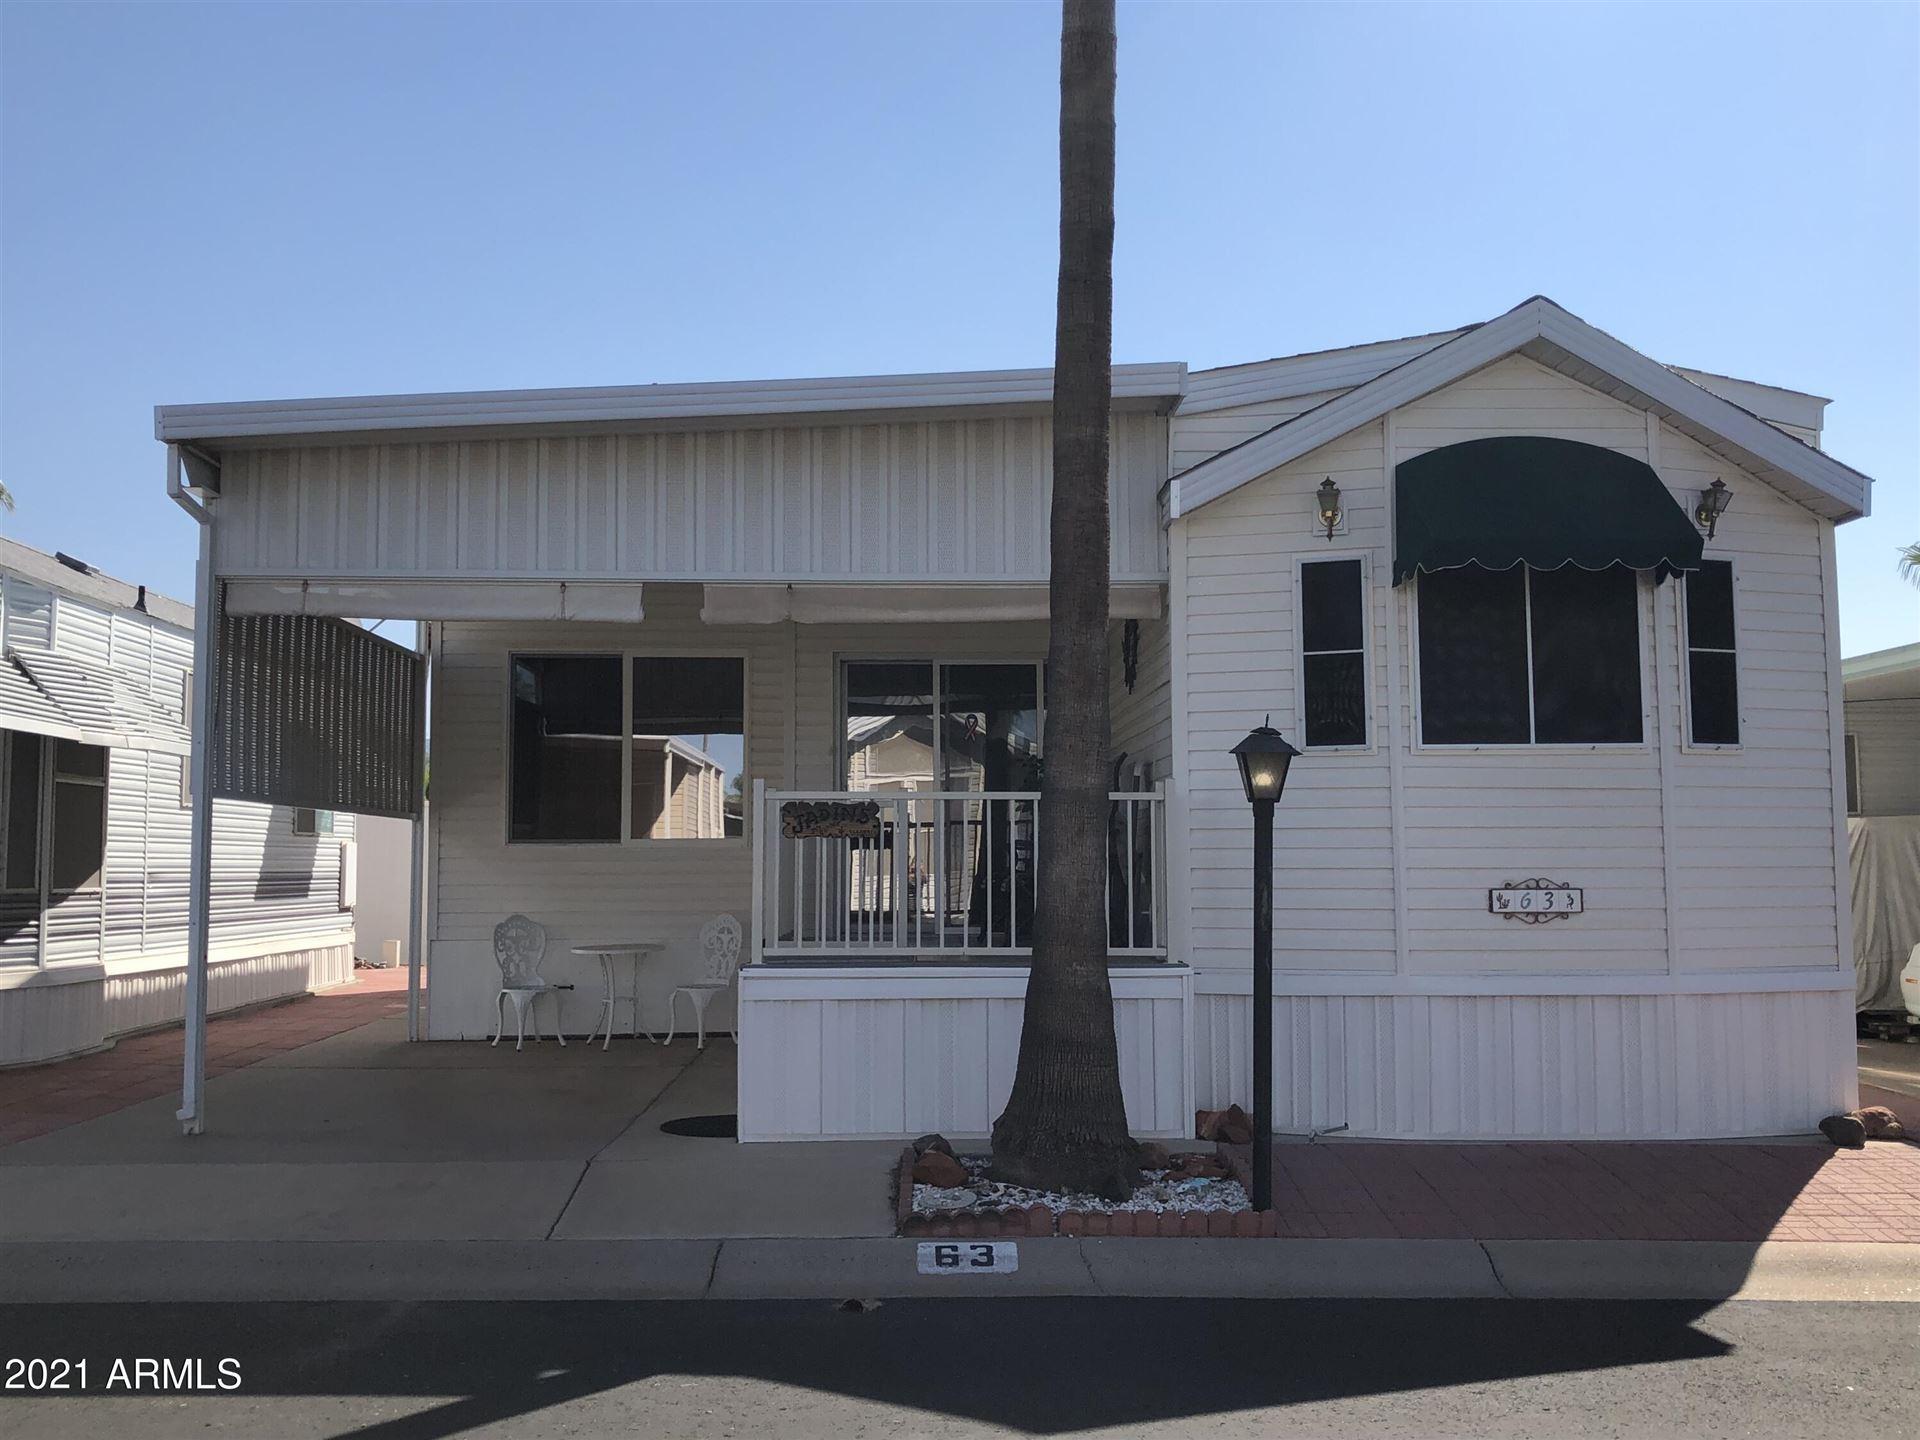 Photo of 63 S JACKNIFE Drive, Apache Junction, AZ 85119 (MLS # 6296568)